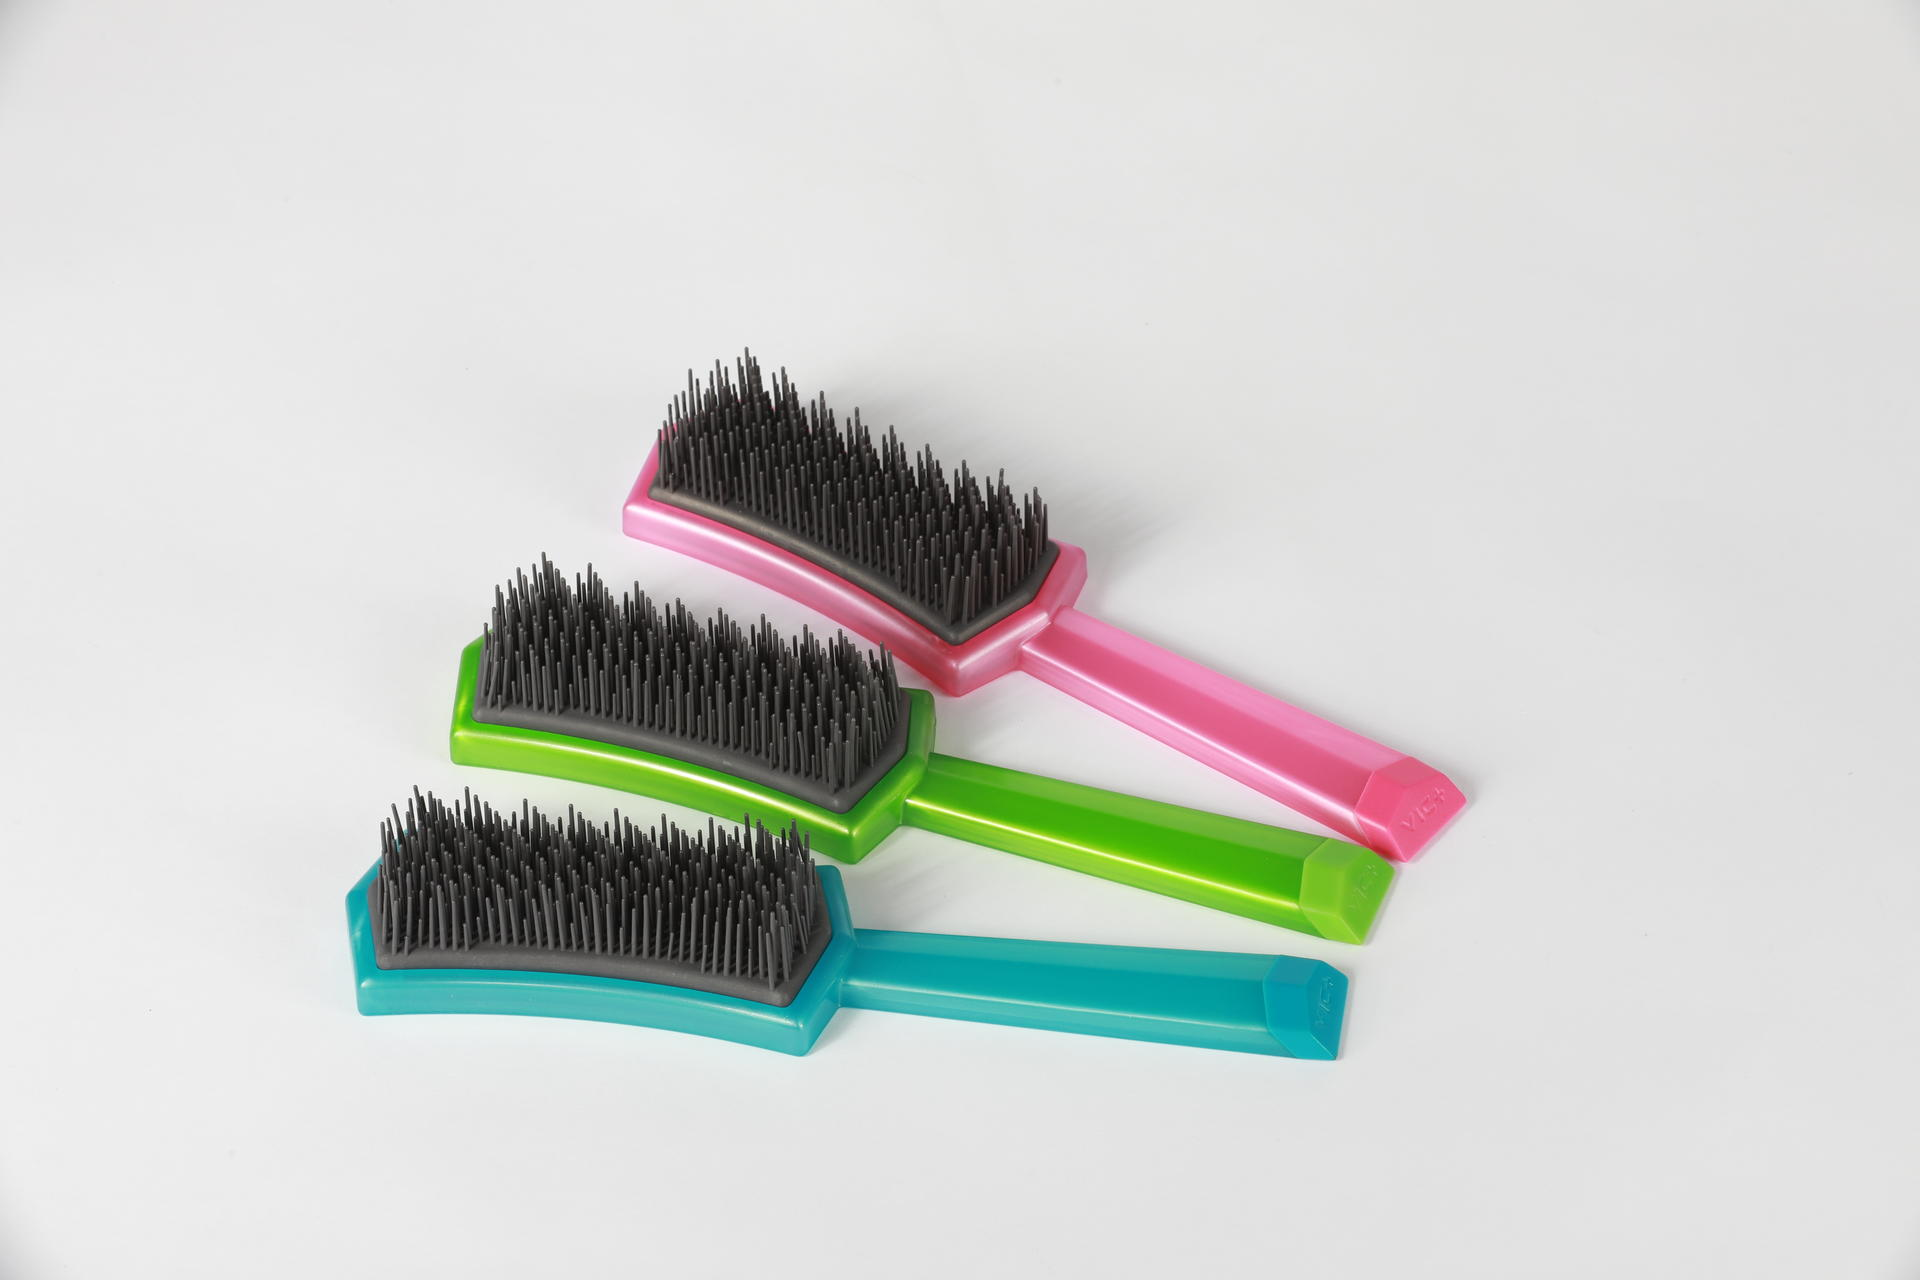 professional plastic fashionable plastic girls hair comb hairbrush brush salon care makeup